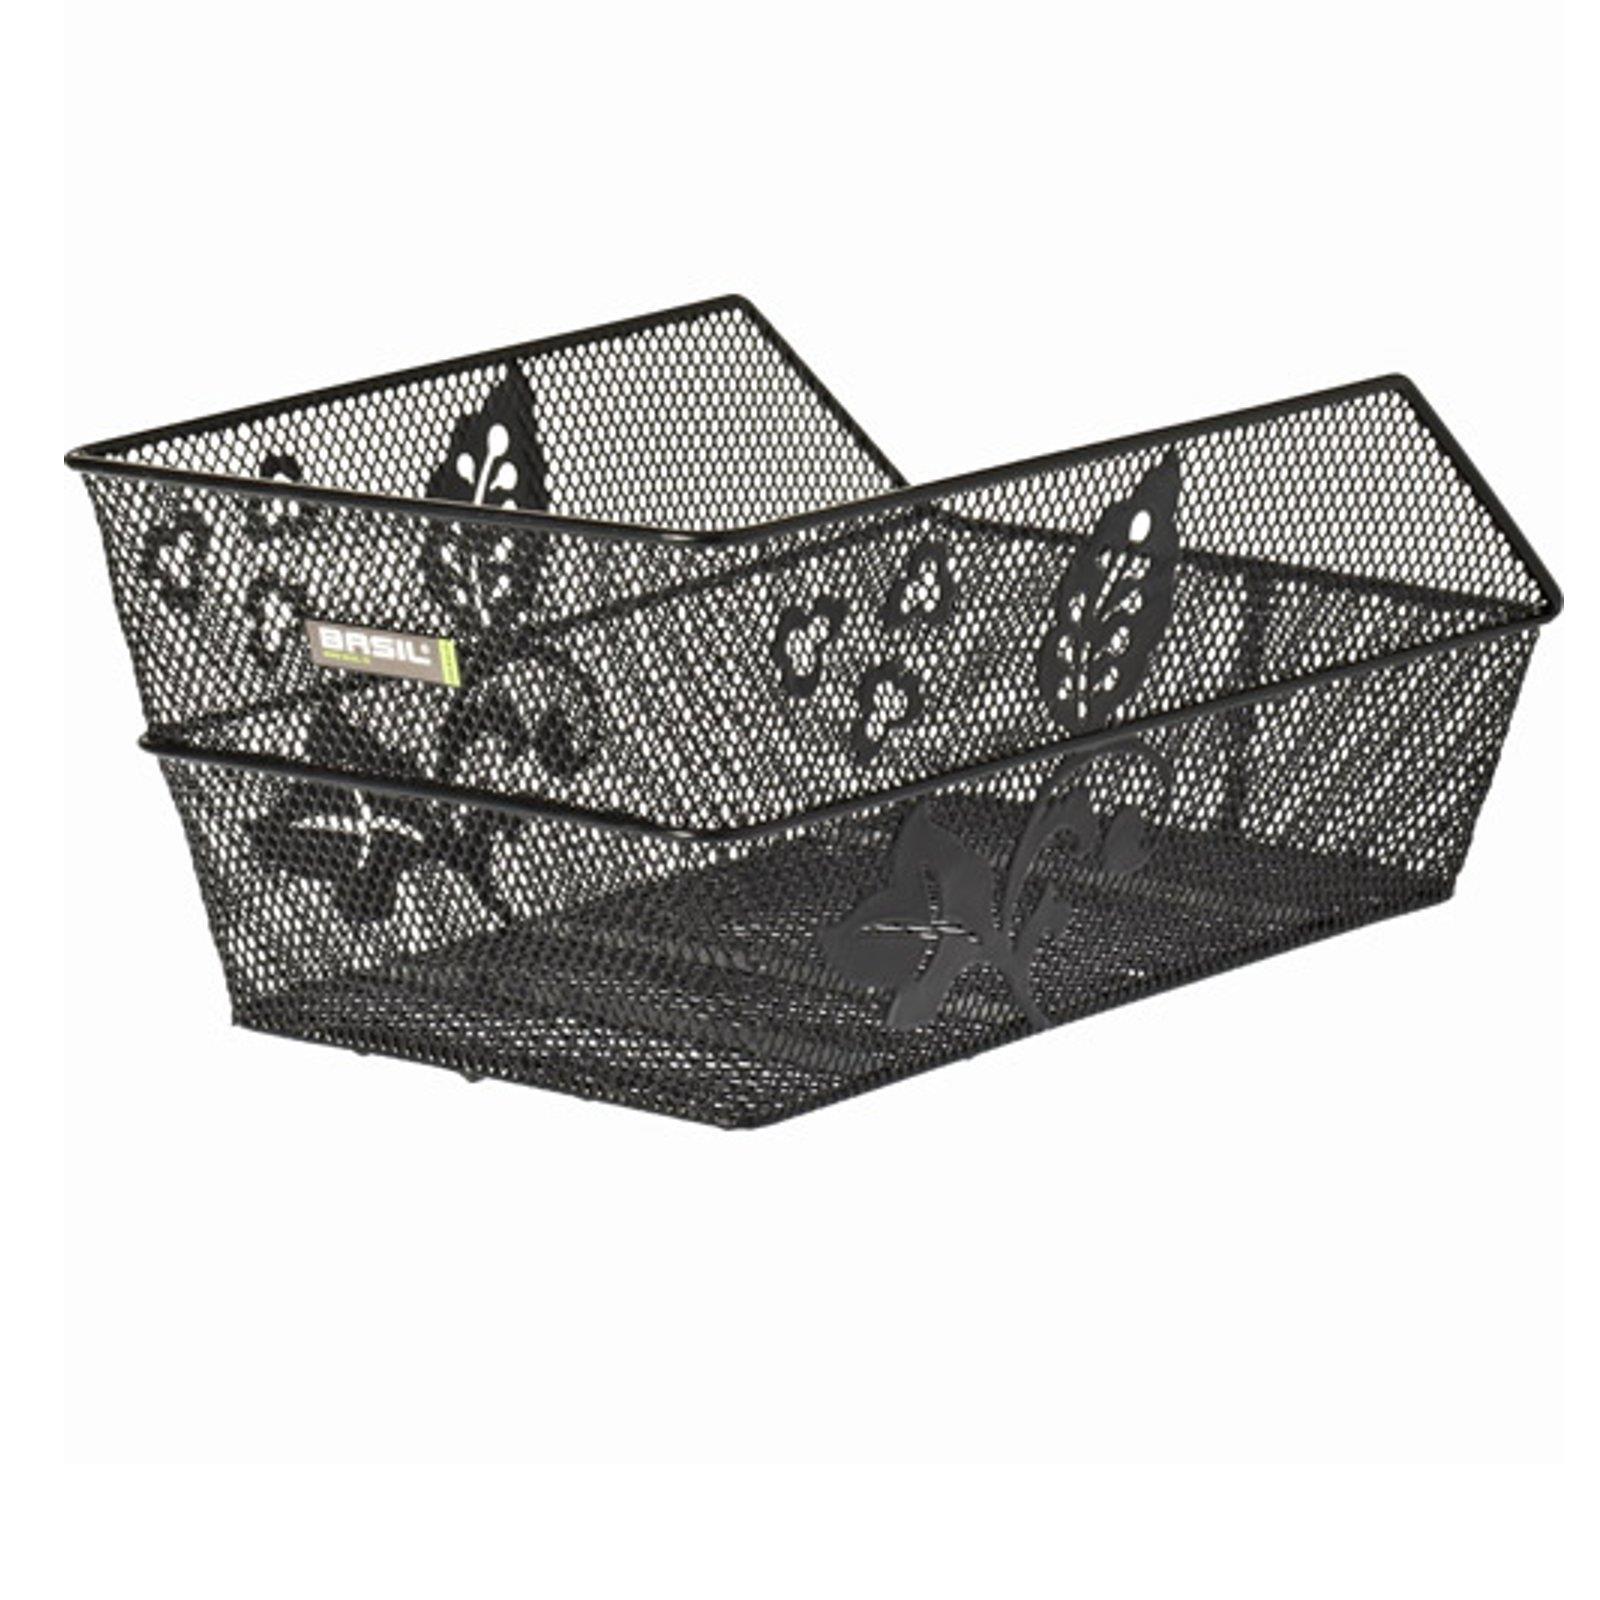 basil taschenkorb cento flower fahrradkorb schultaschen korb kinder fahrrad rad ebay. Black Bedroom Furniture Sets. Home Design Ideas